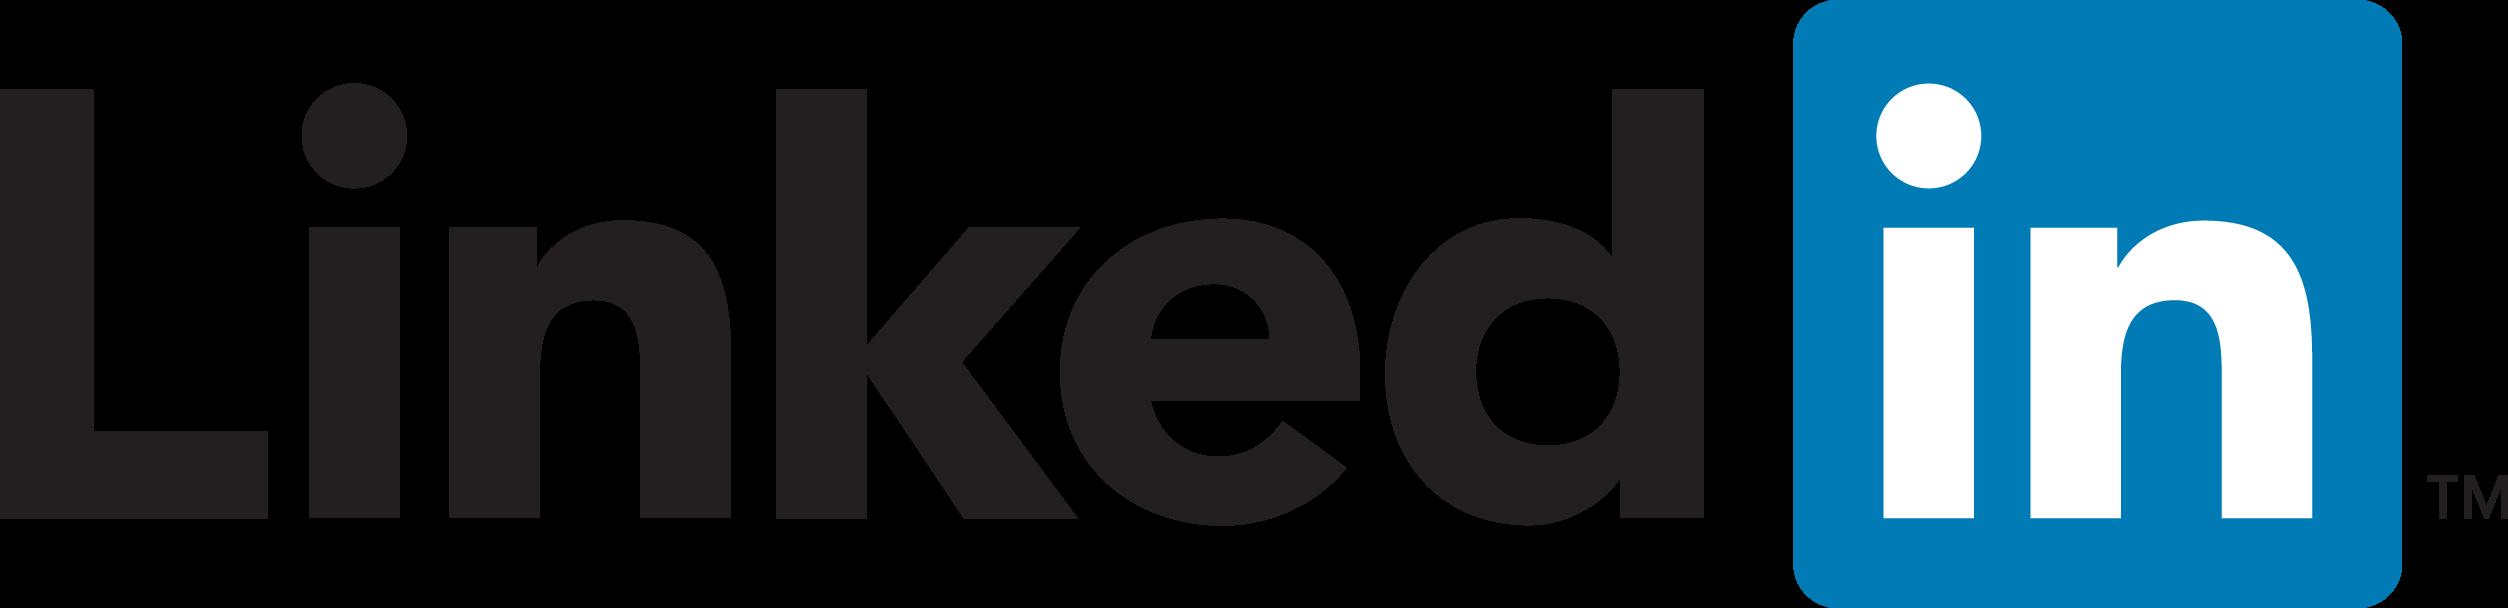 Linkedin - Funnel Marketing